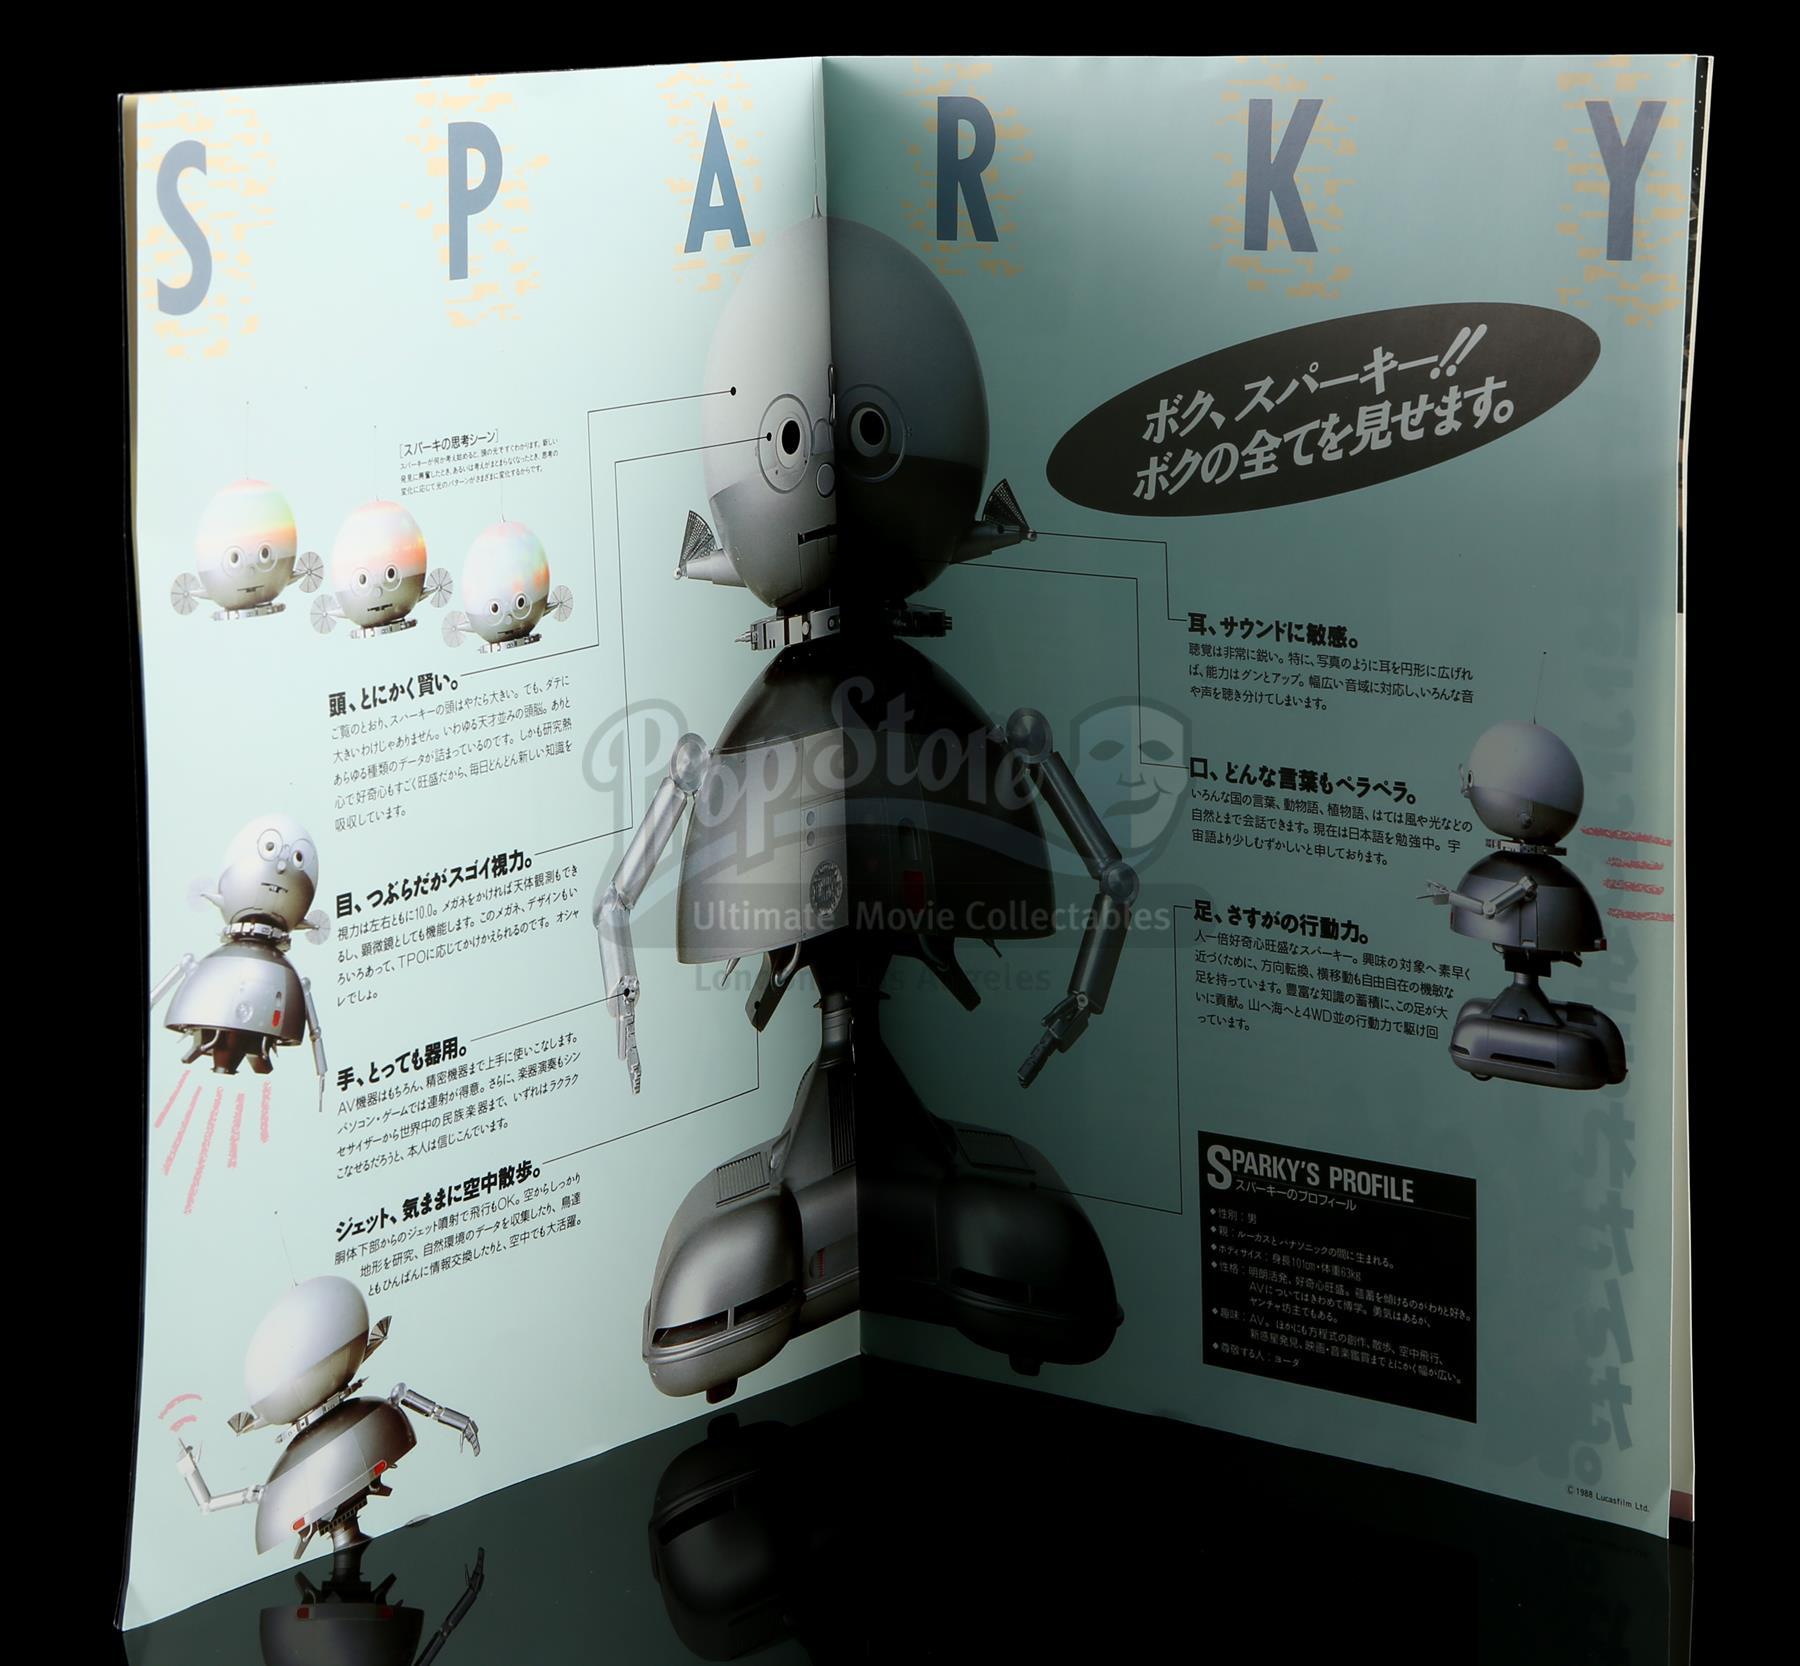 Sparky The Robot Miniature